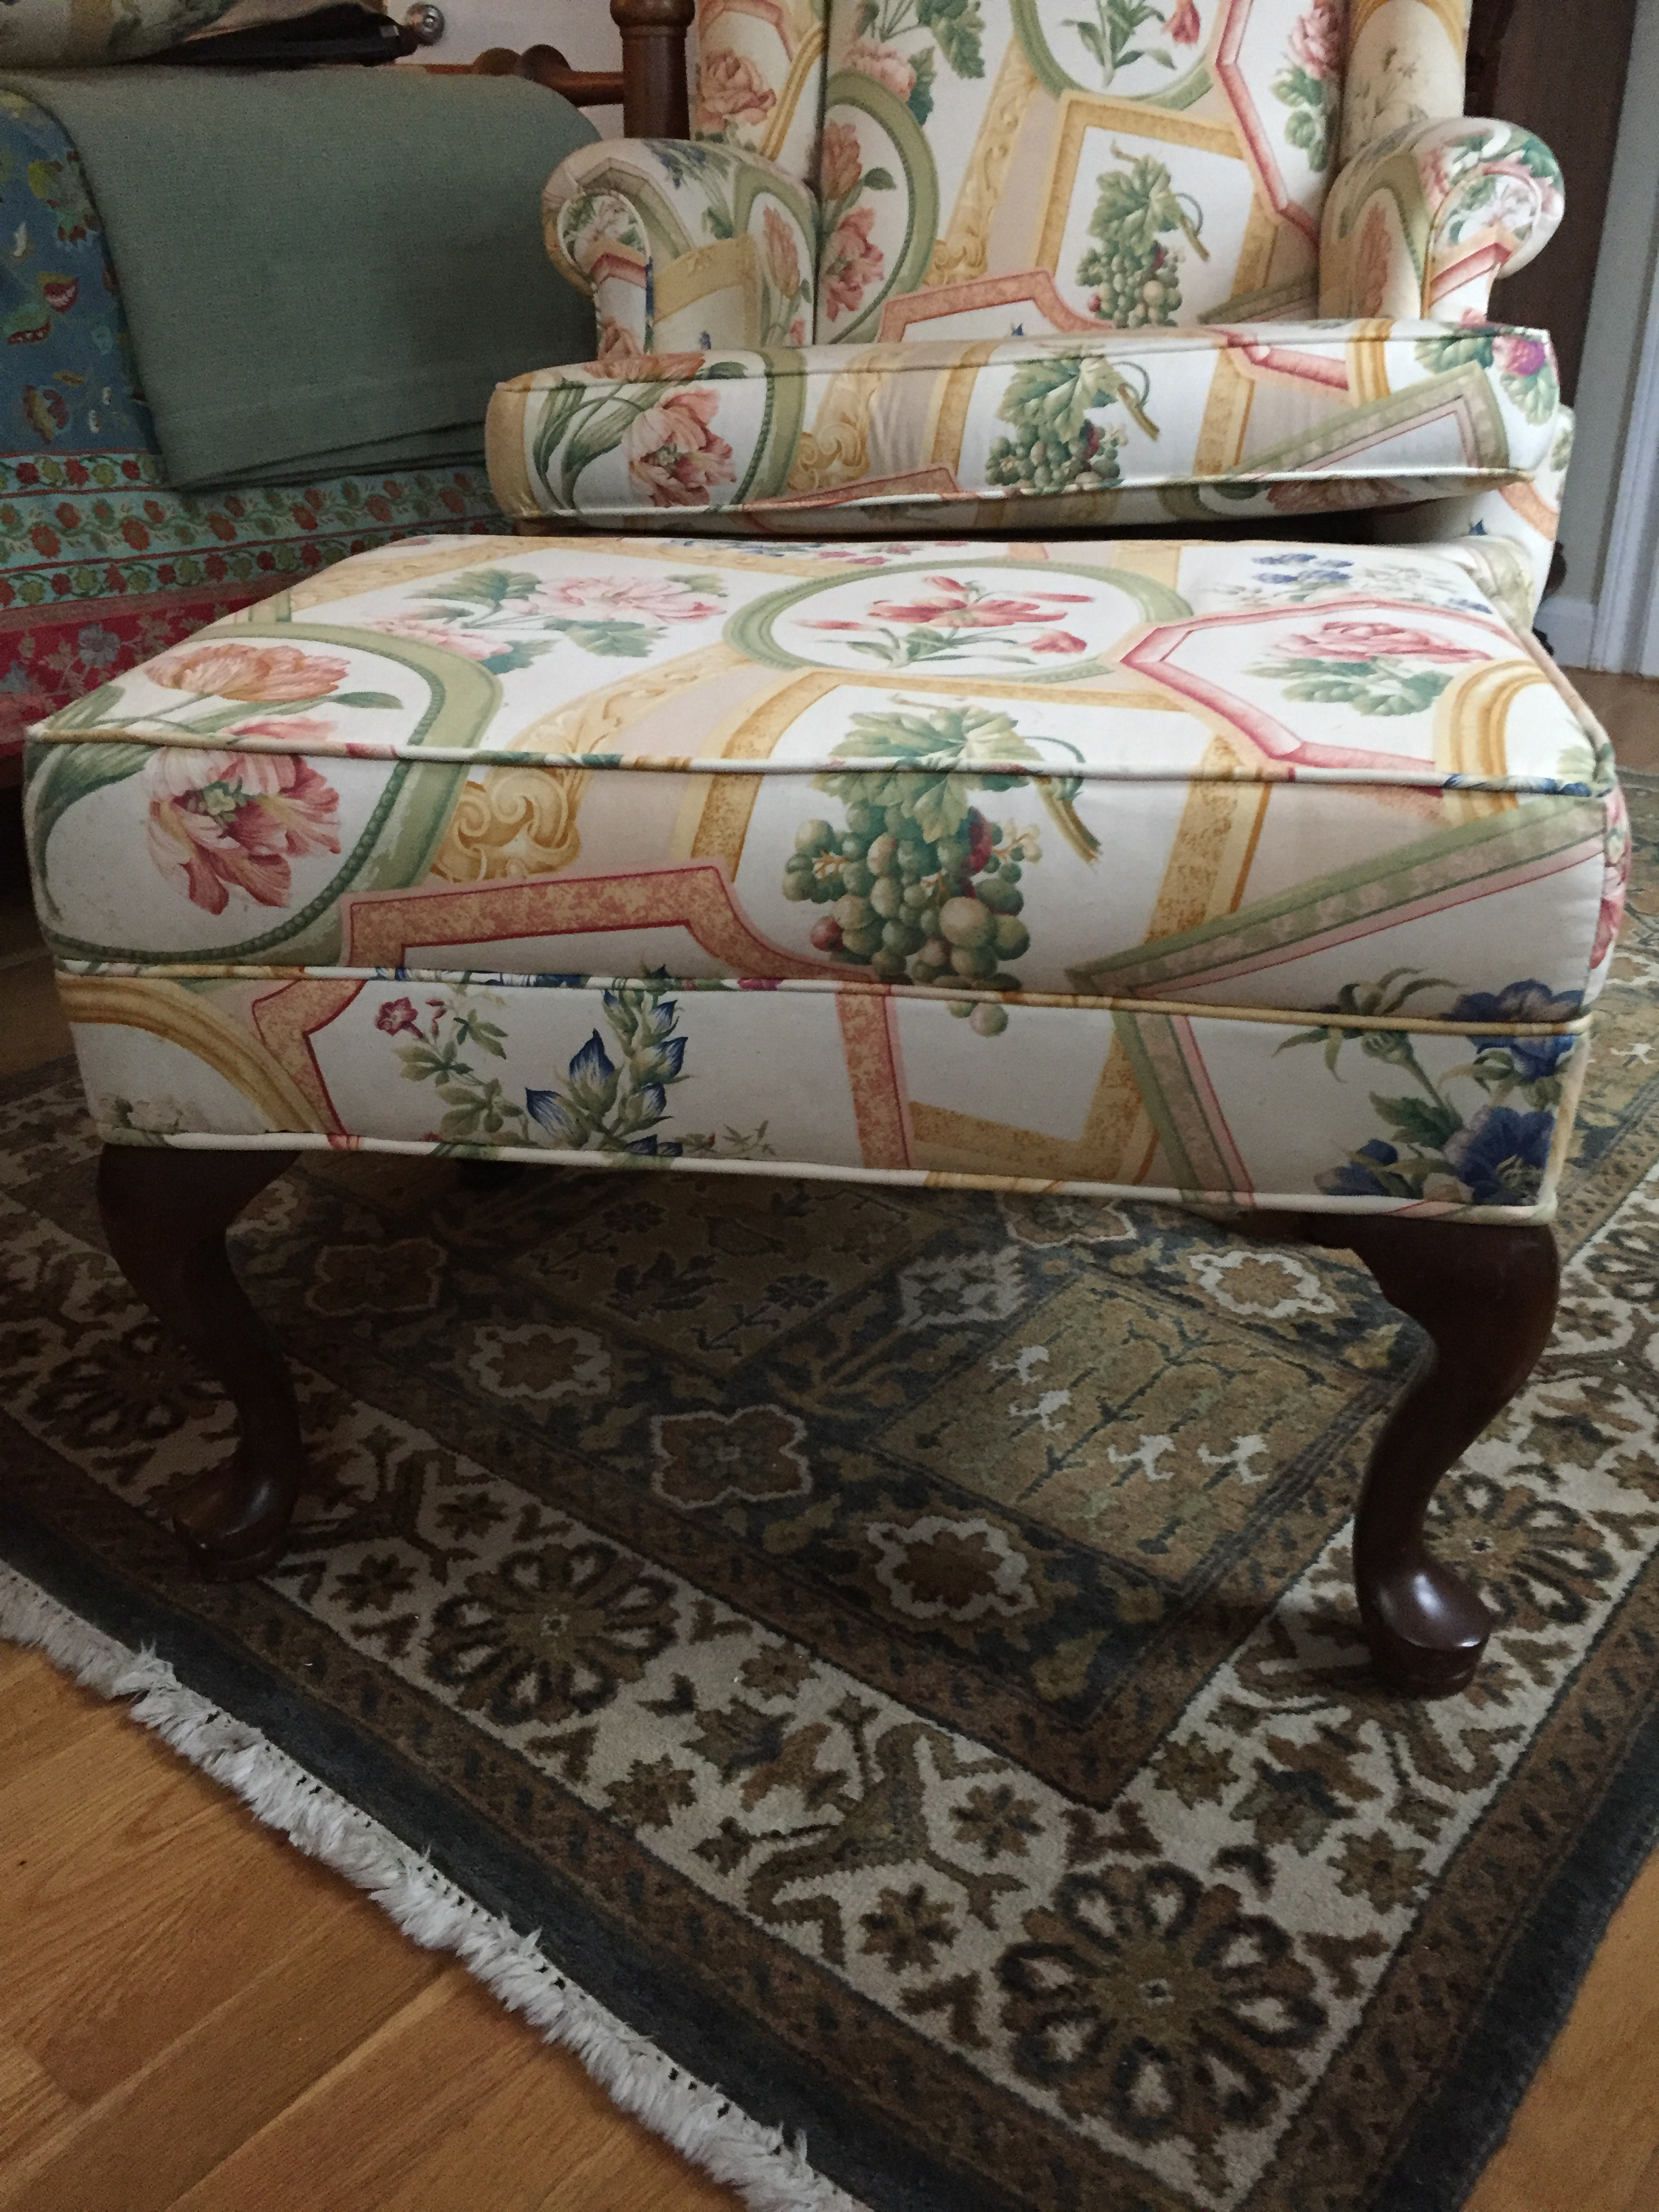 Ethan Allen Queen Anne Wing Chair & Ottoman  Chairish. Crushed Granite Patio. Bathroom Storage Ideas. Black Tub. Pink Bathroom Ideas. 42 Bathroom Vanity Cabinet. Eleganza Tile. Wine Barrel Light Fixtures. Shower Kit